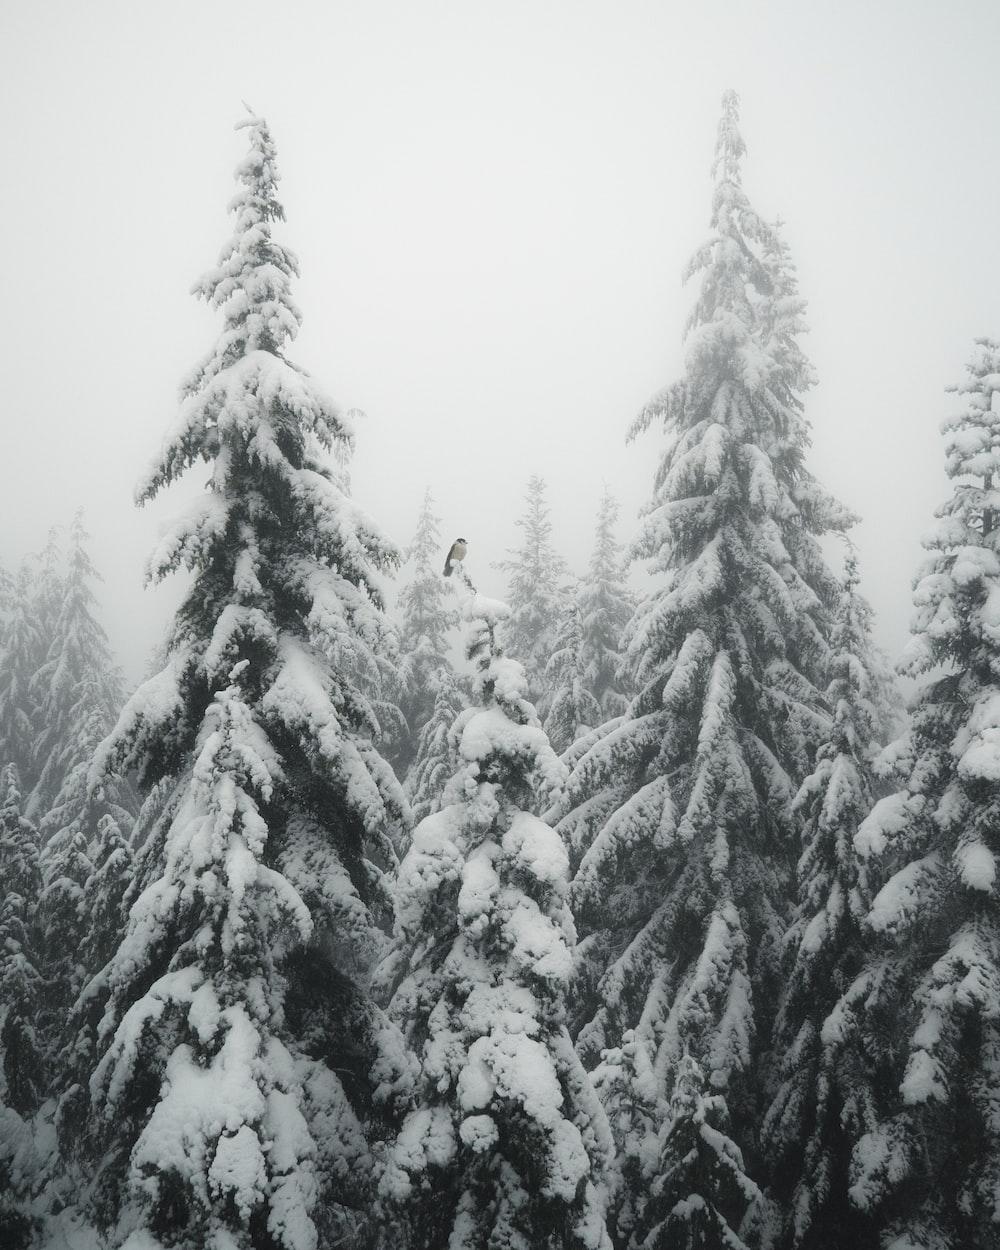 snow coated pin trees photo – Free Plant Image on Unsplash